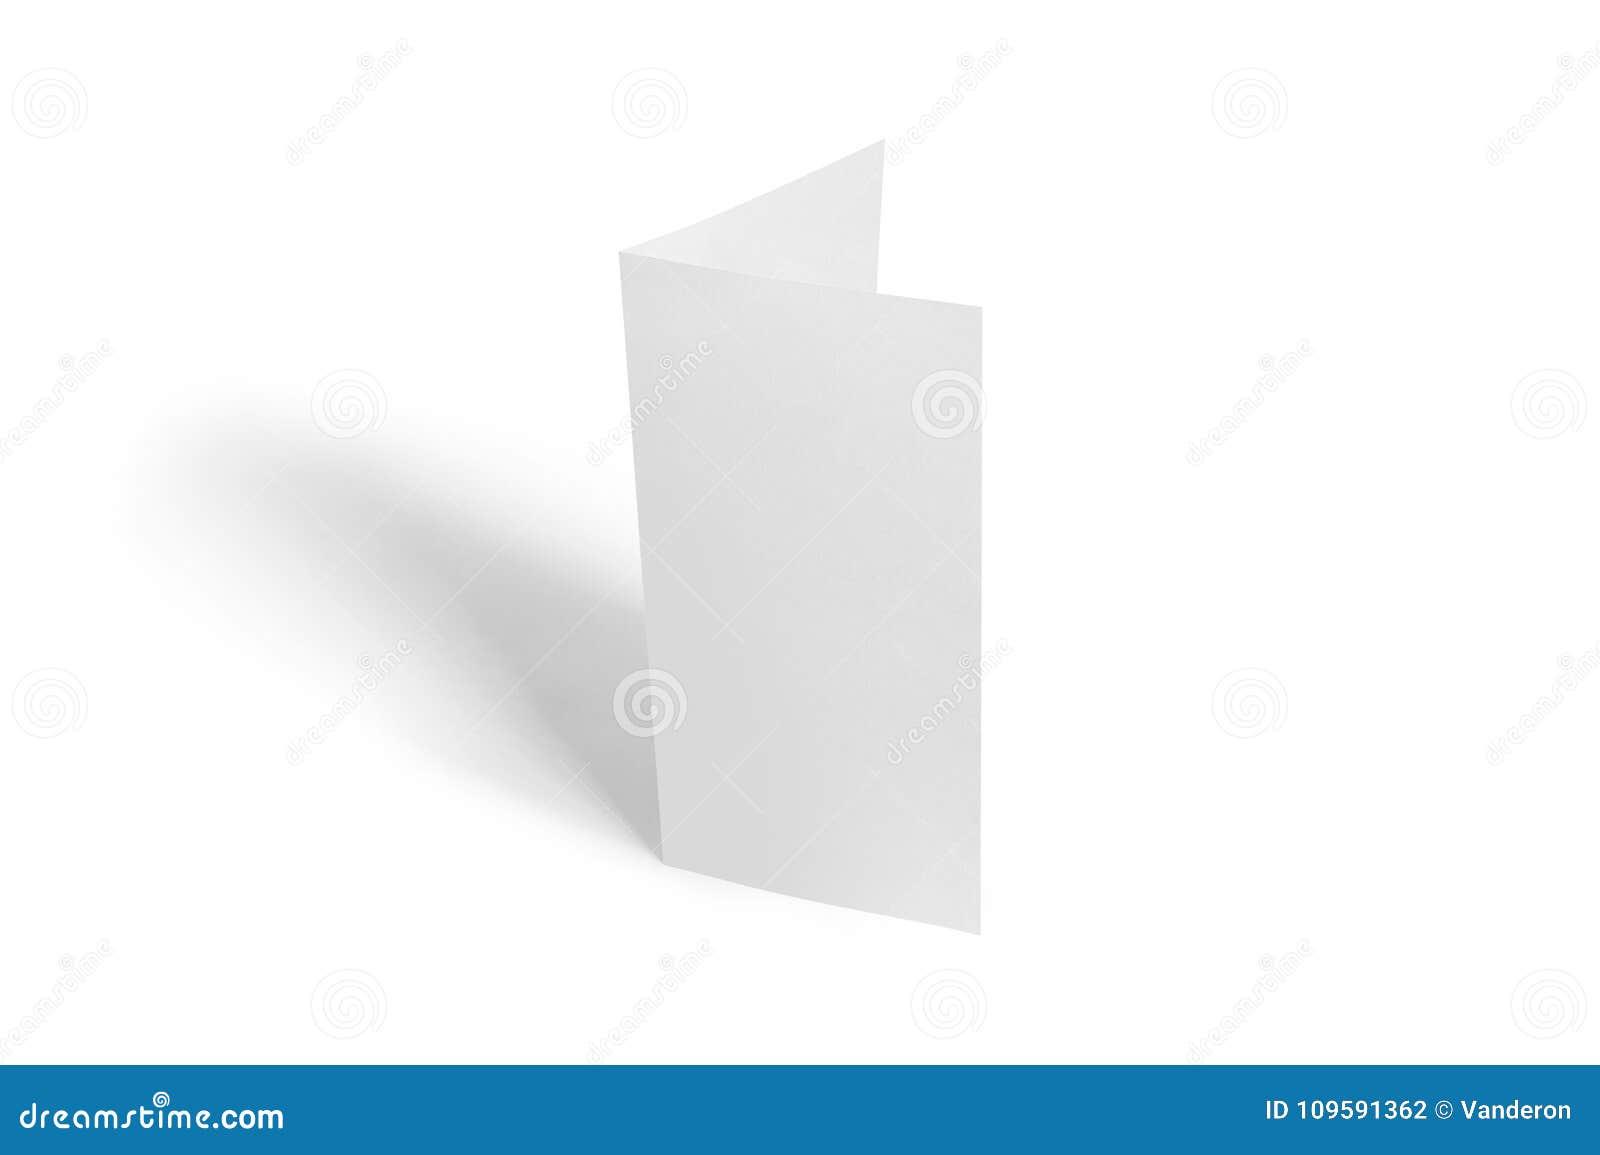 Two Leaf Flyer Mock Up Template Blank Brochure White